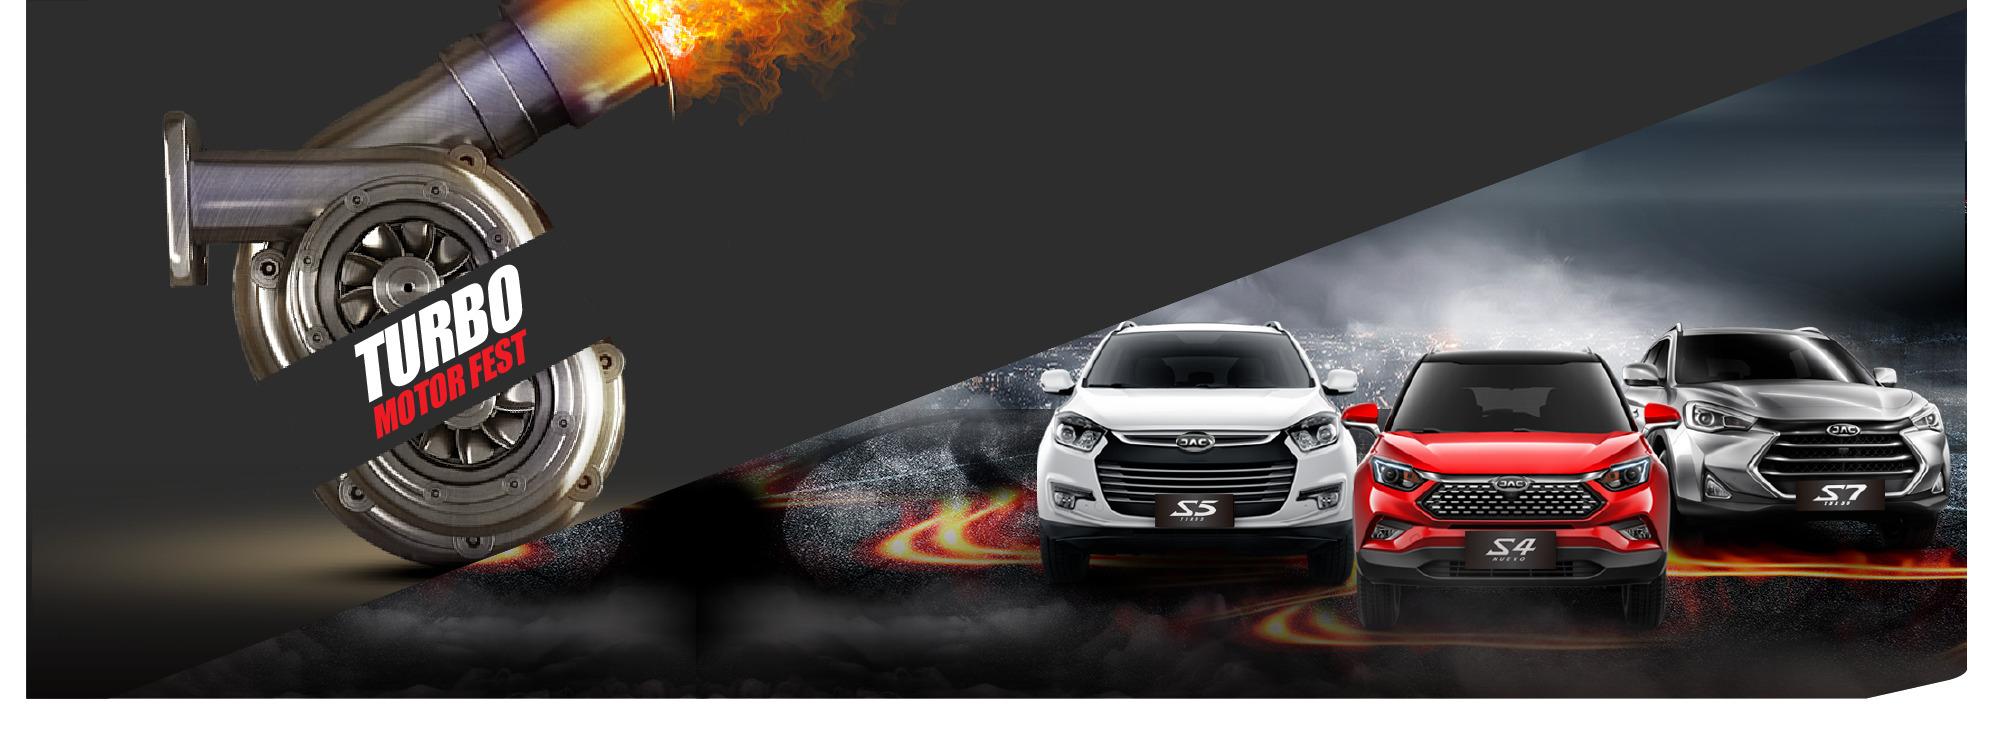 El Turbo Motor Fest se vive en JAC Autos